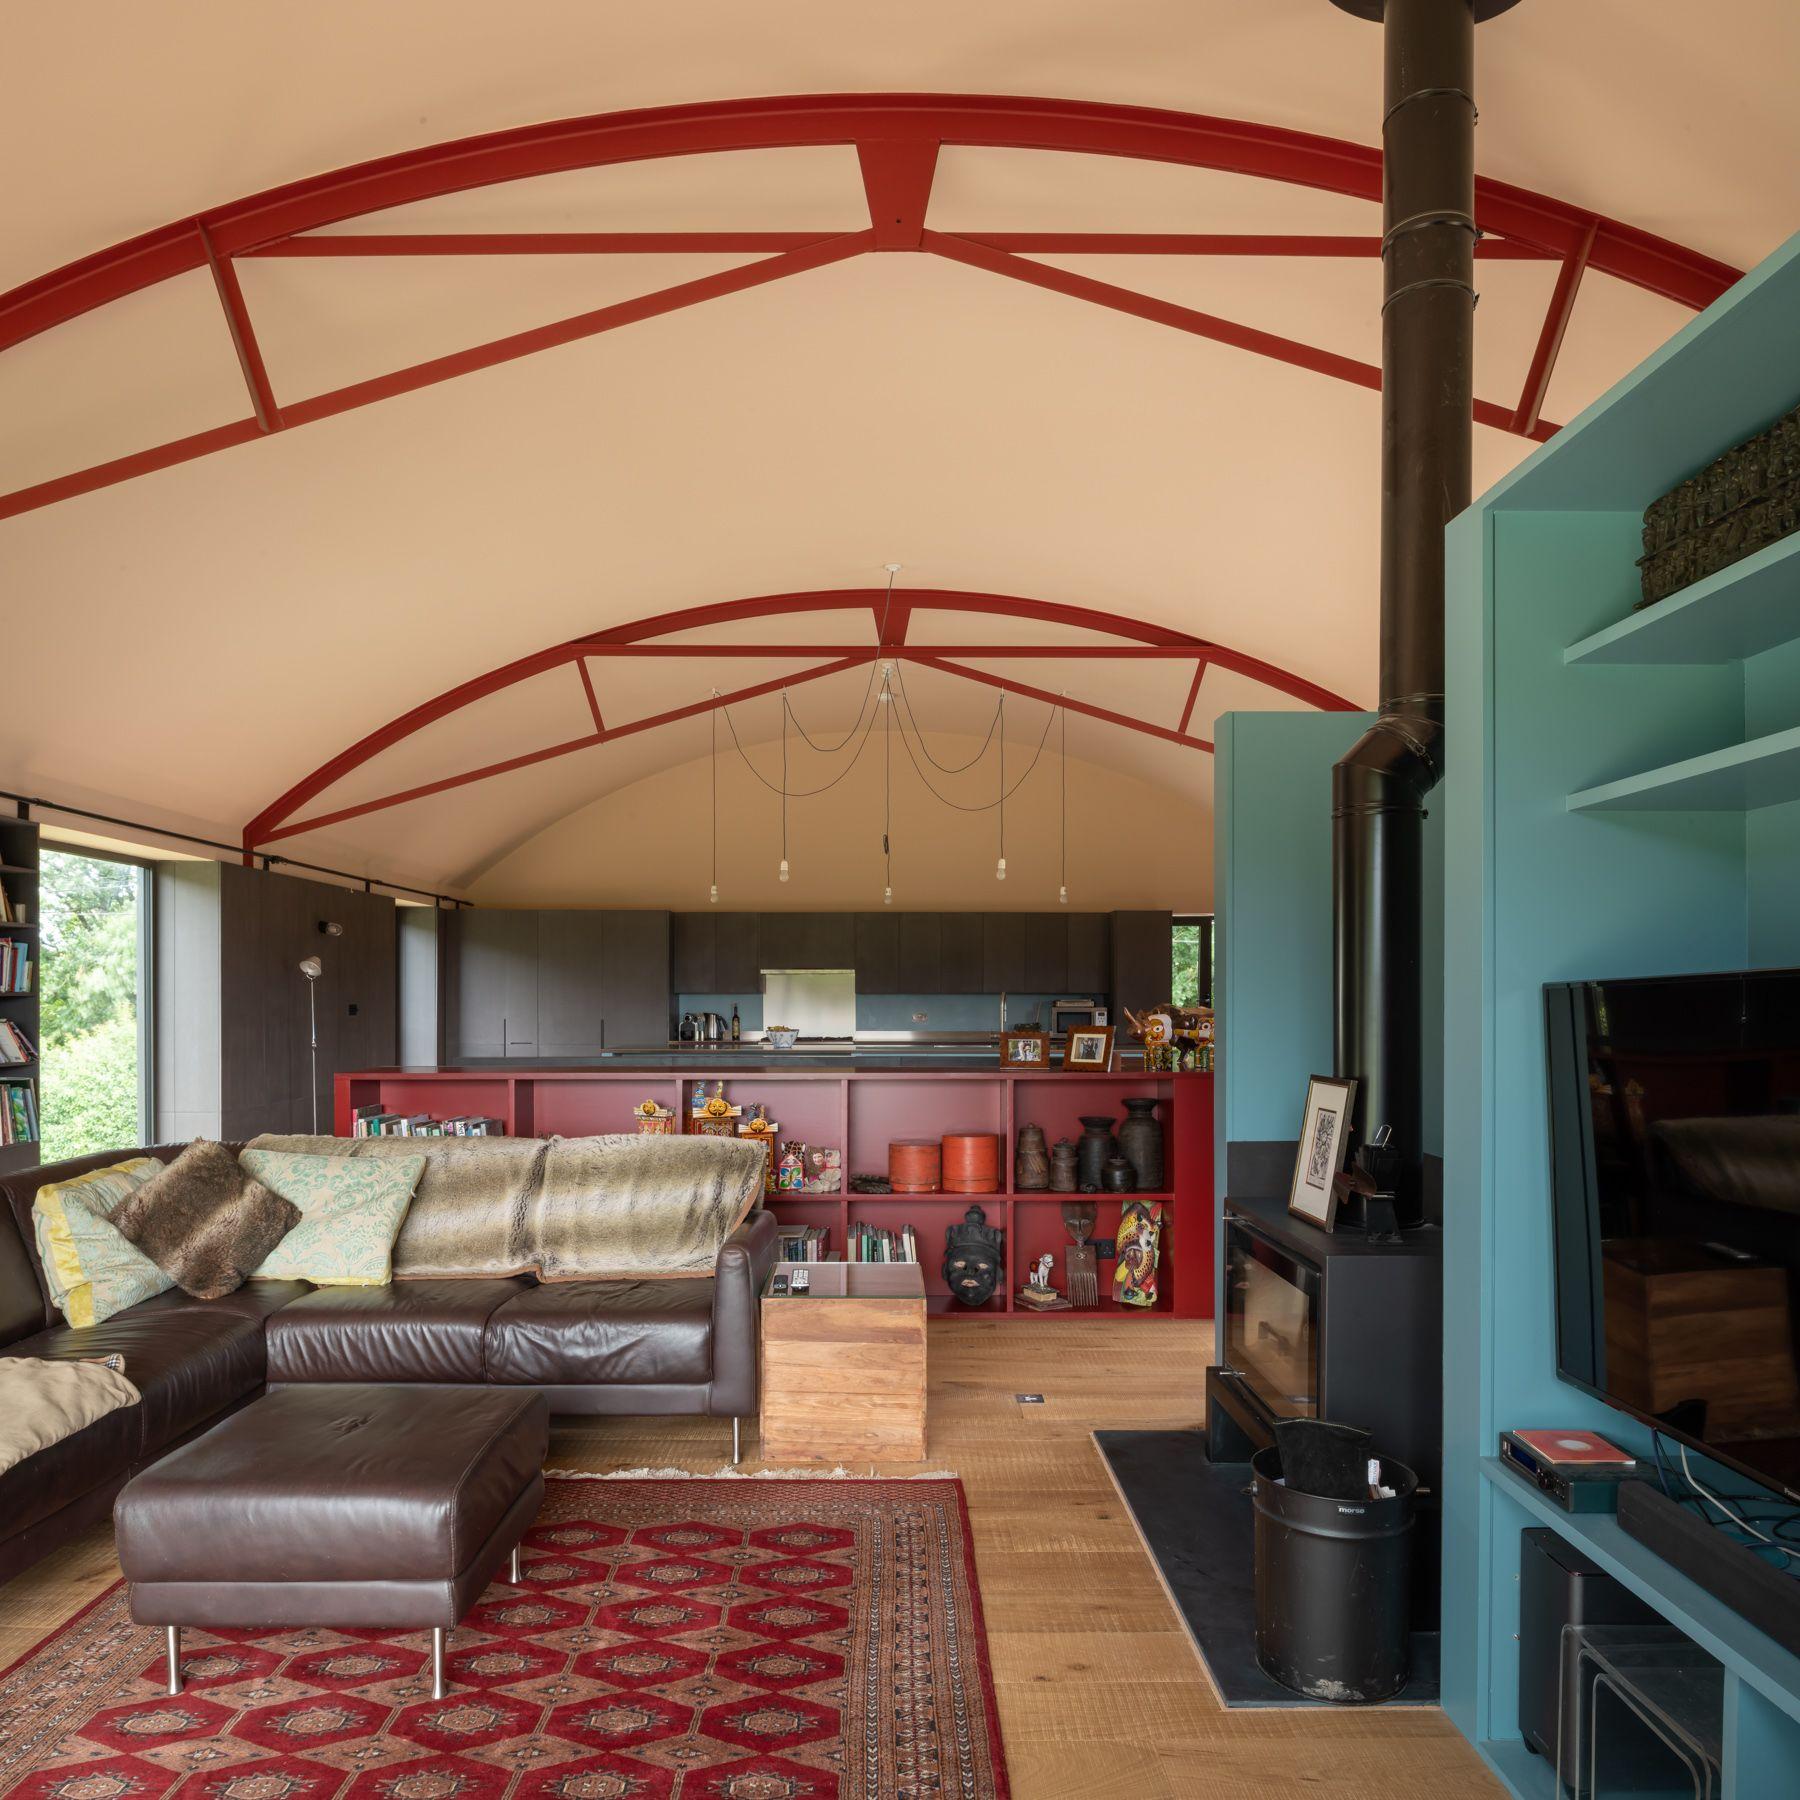 Dutch Barn by Sandy Rendel Architects. Copyright Jim Stephenson 2019